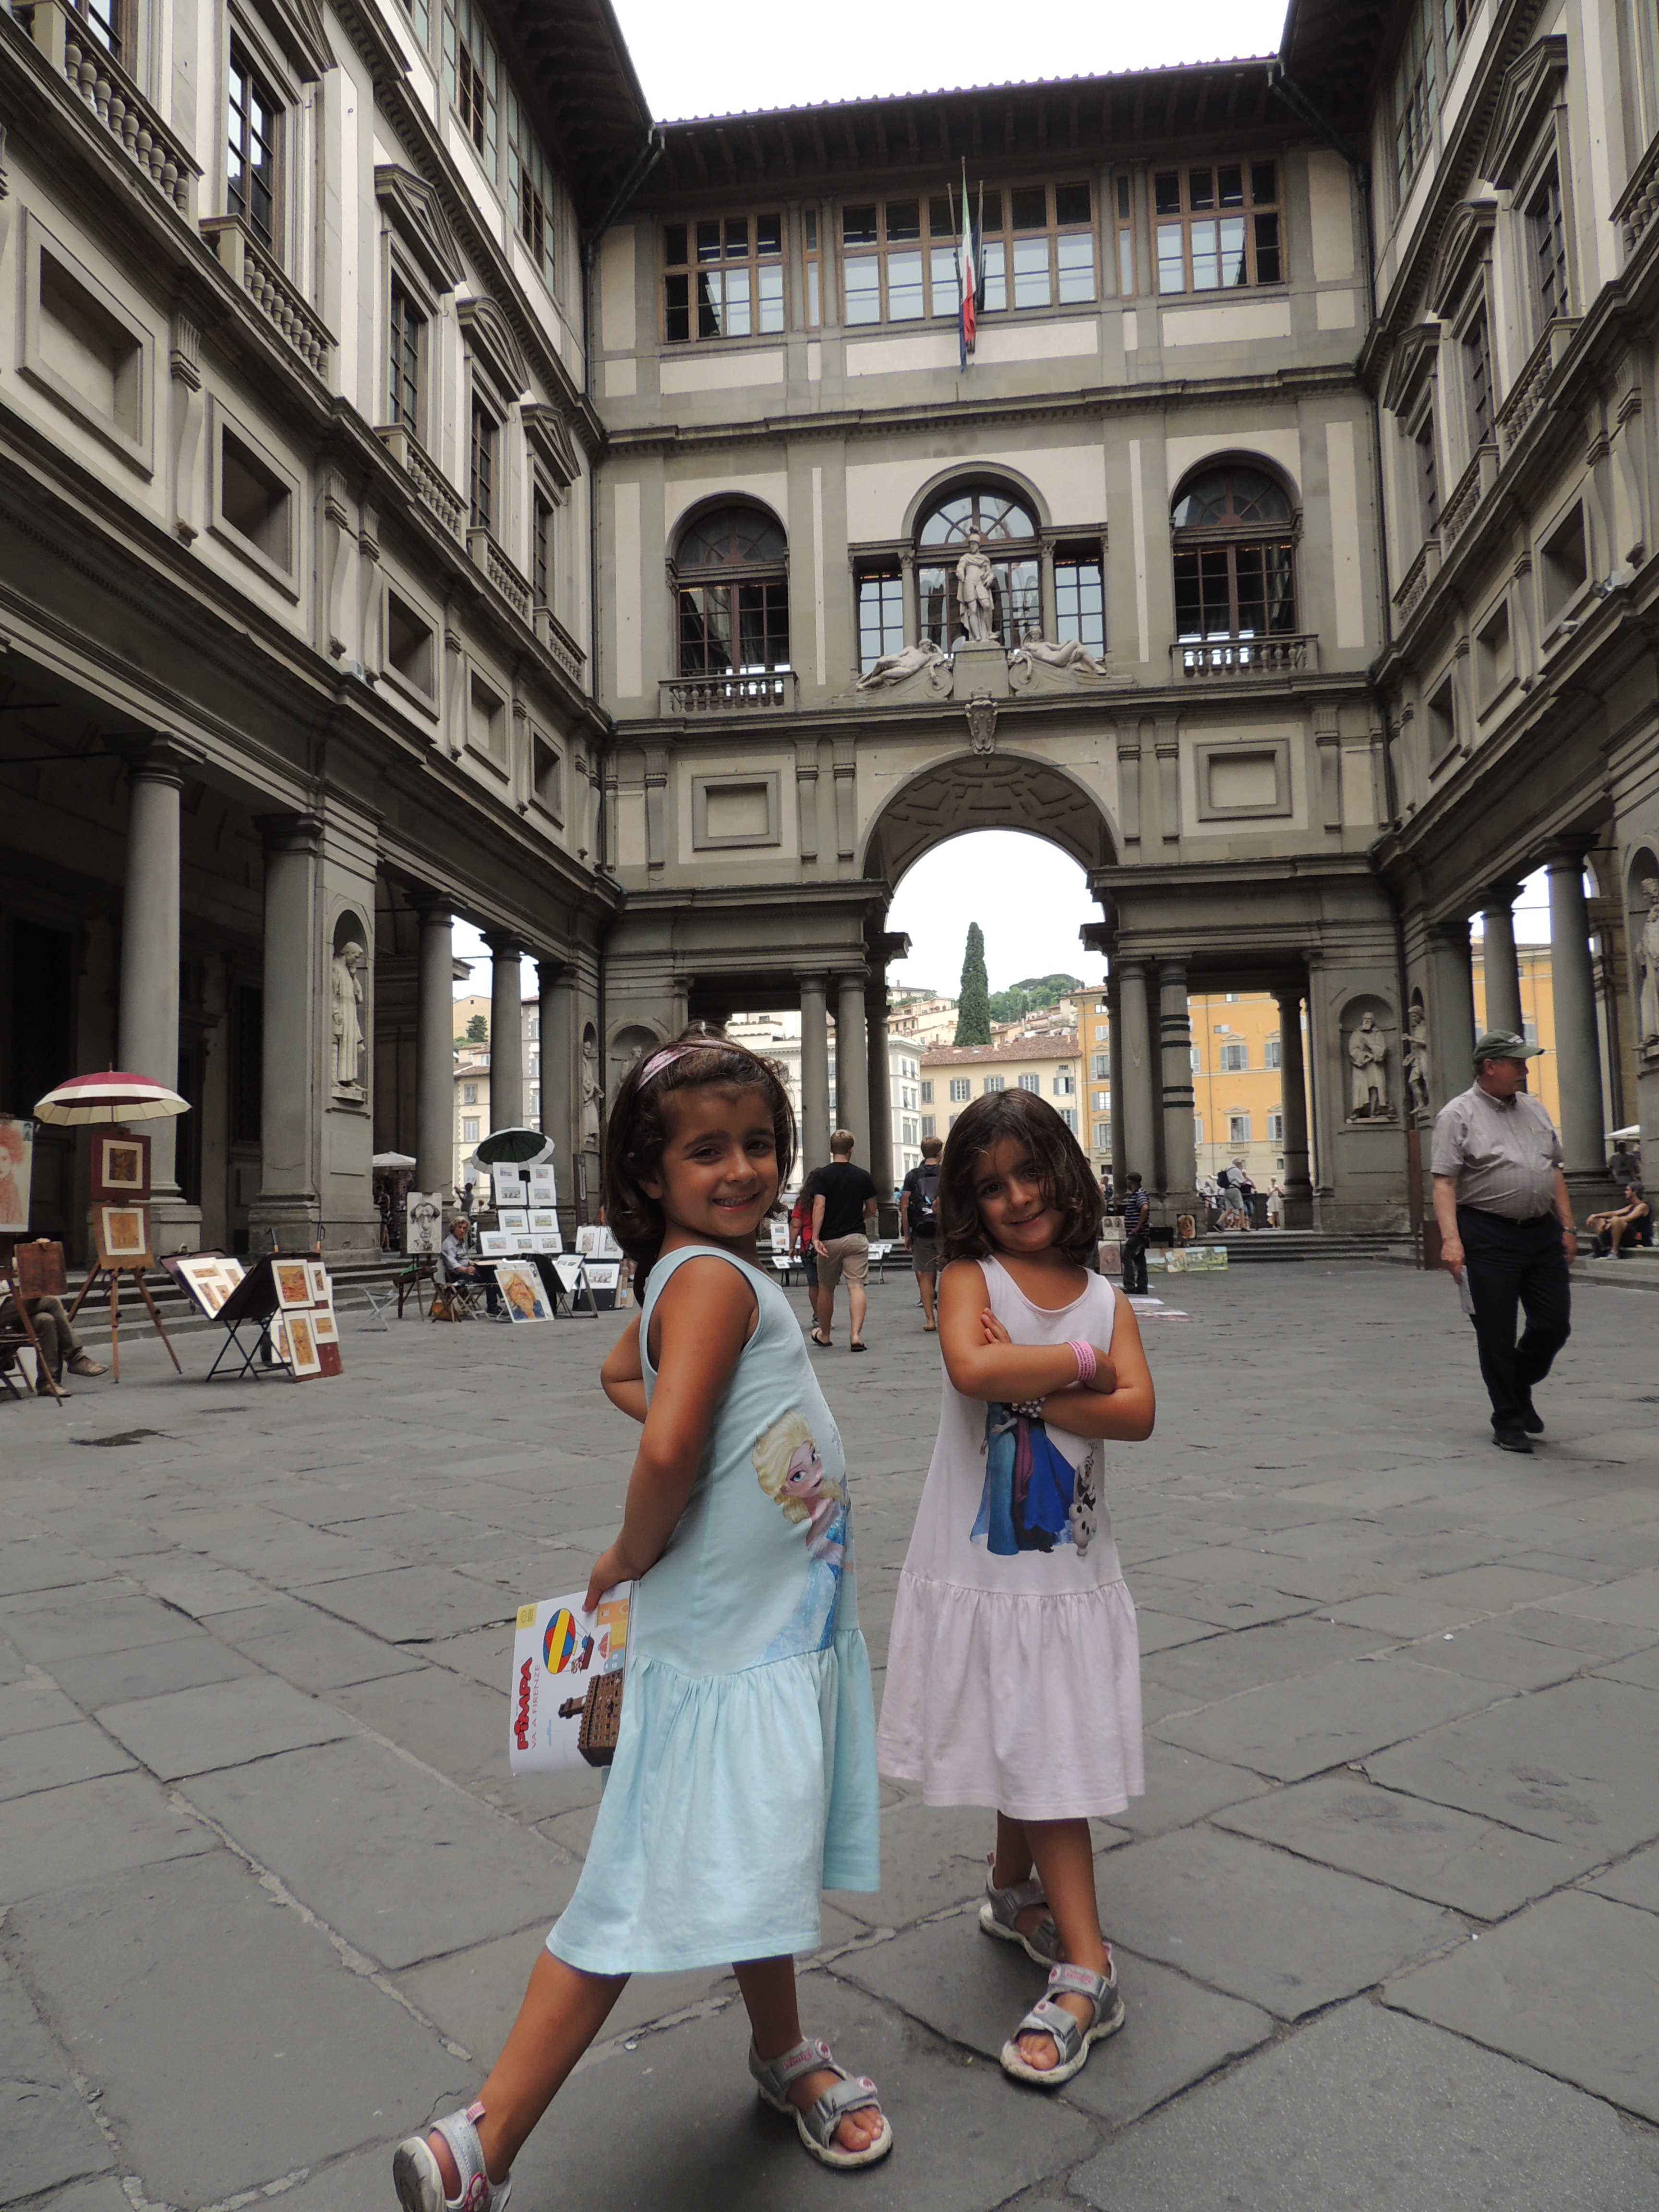 Hotel por Famiglie en con viaggio bambini - Best Western Italia Pacchetto niños